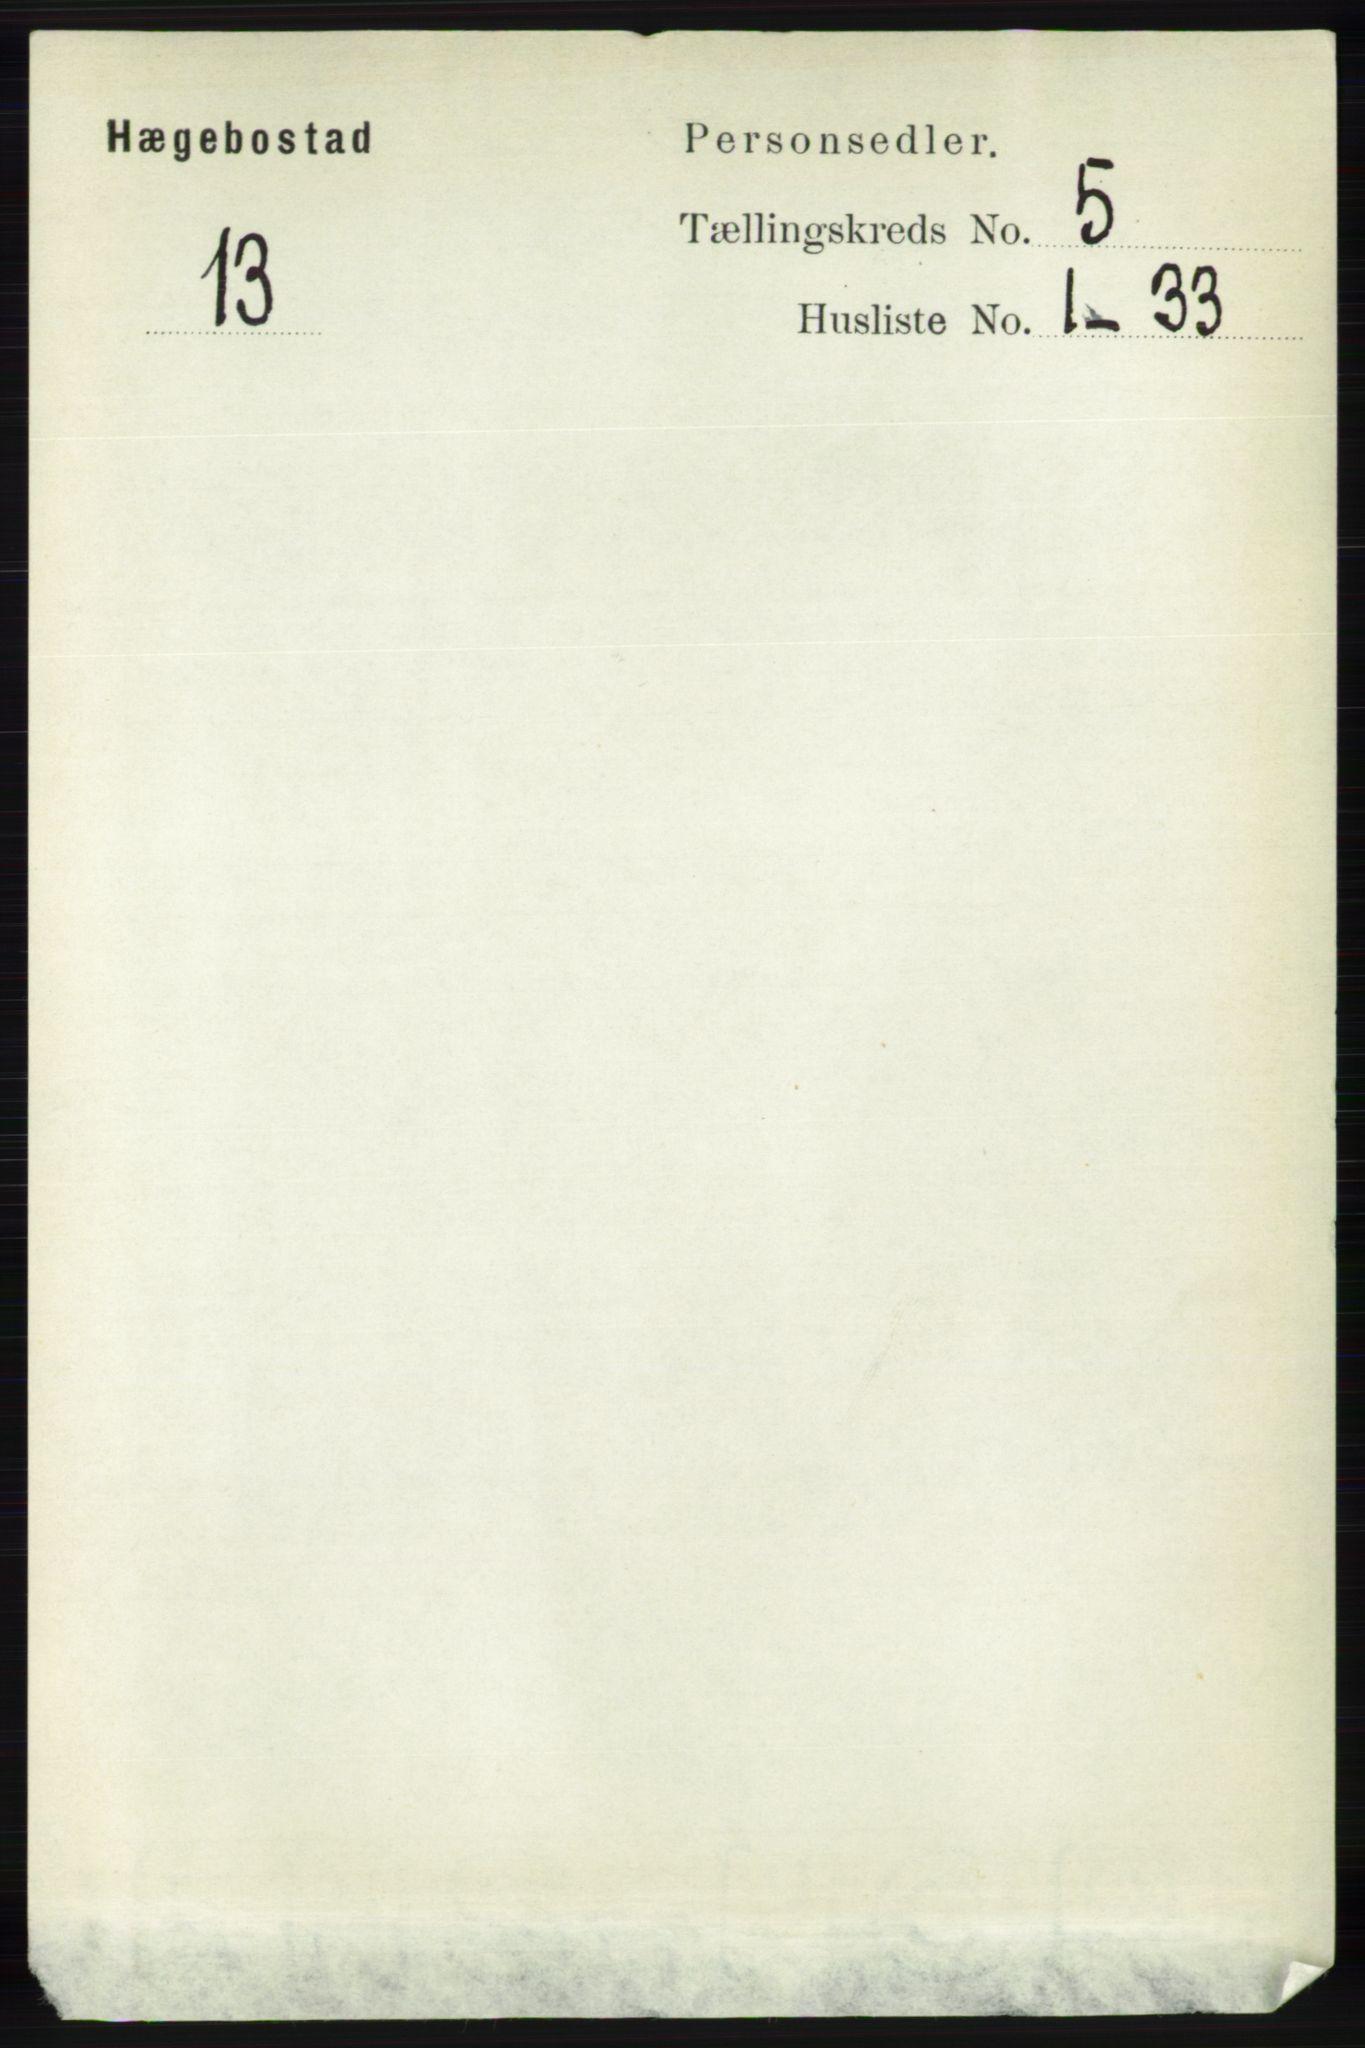 RA, Folketelling 1891 for 1034 Hægebostad herred, 1891, s. 1489